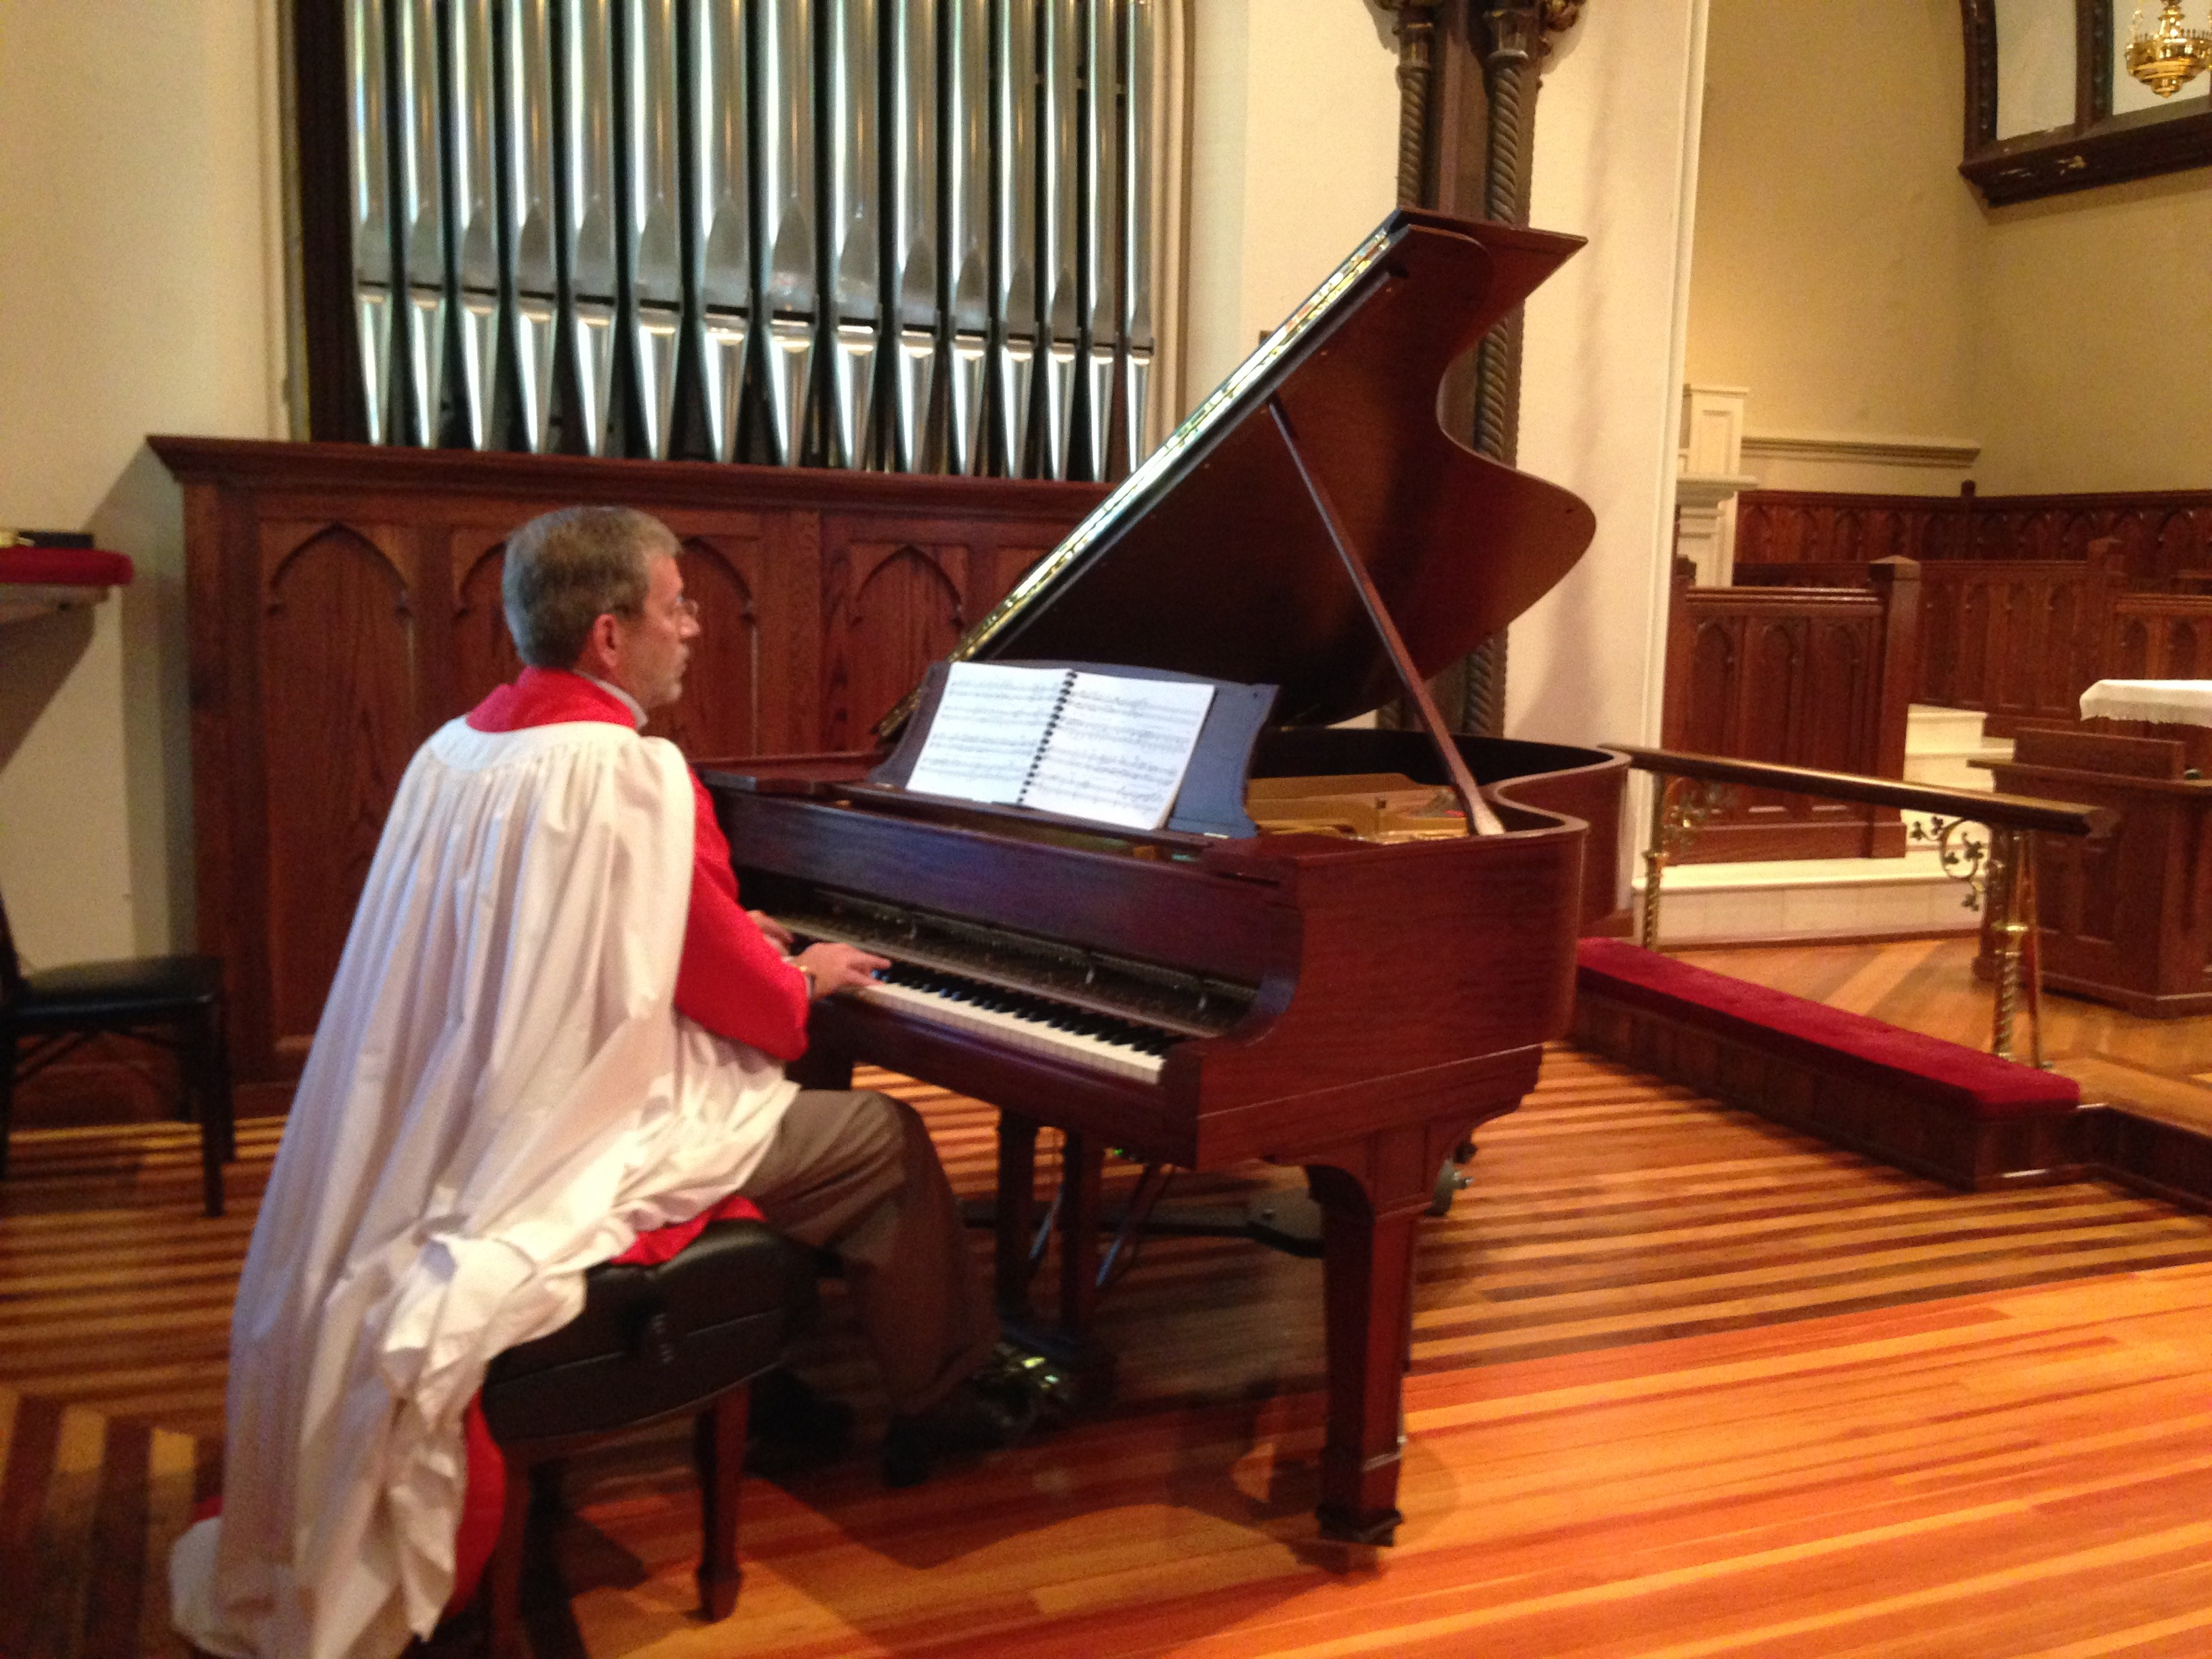 bcedbf41cda5f9d9d9b4_Greg_Piano_1.JPG